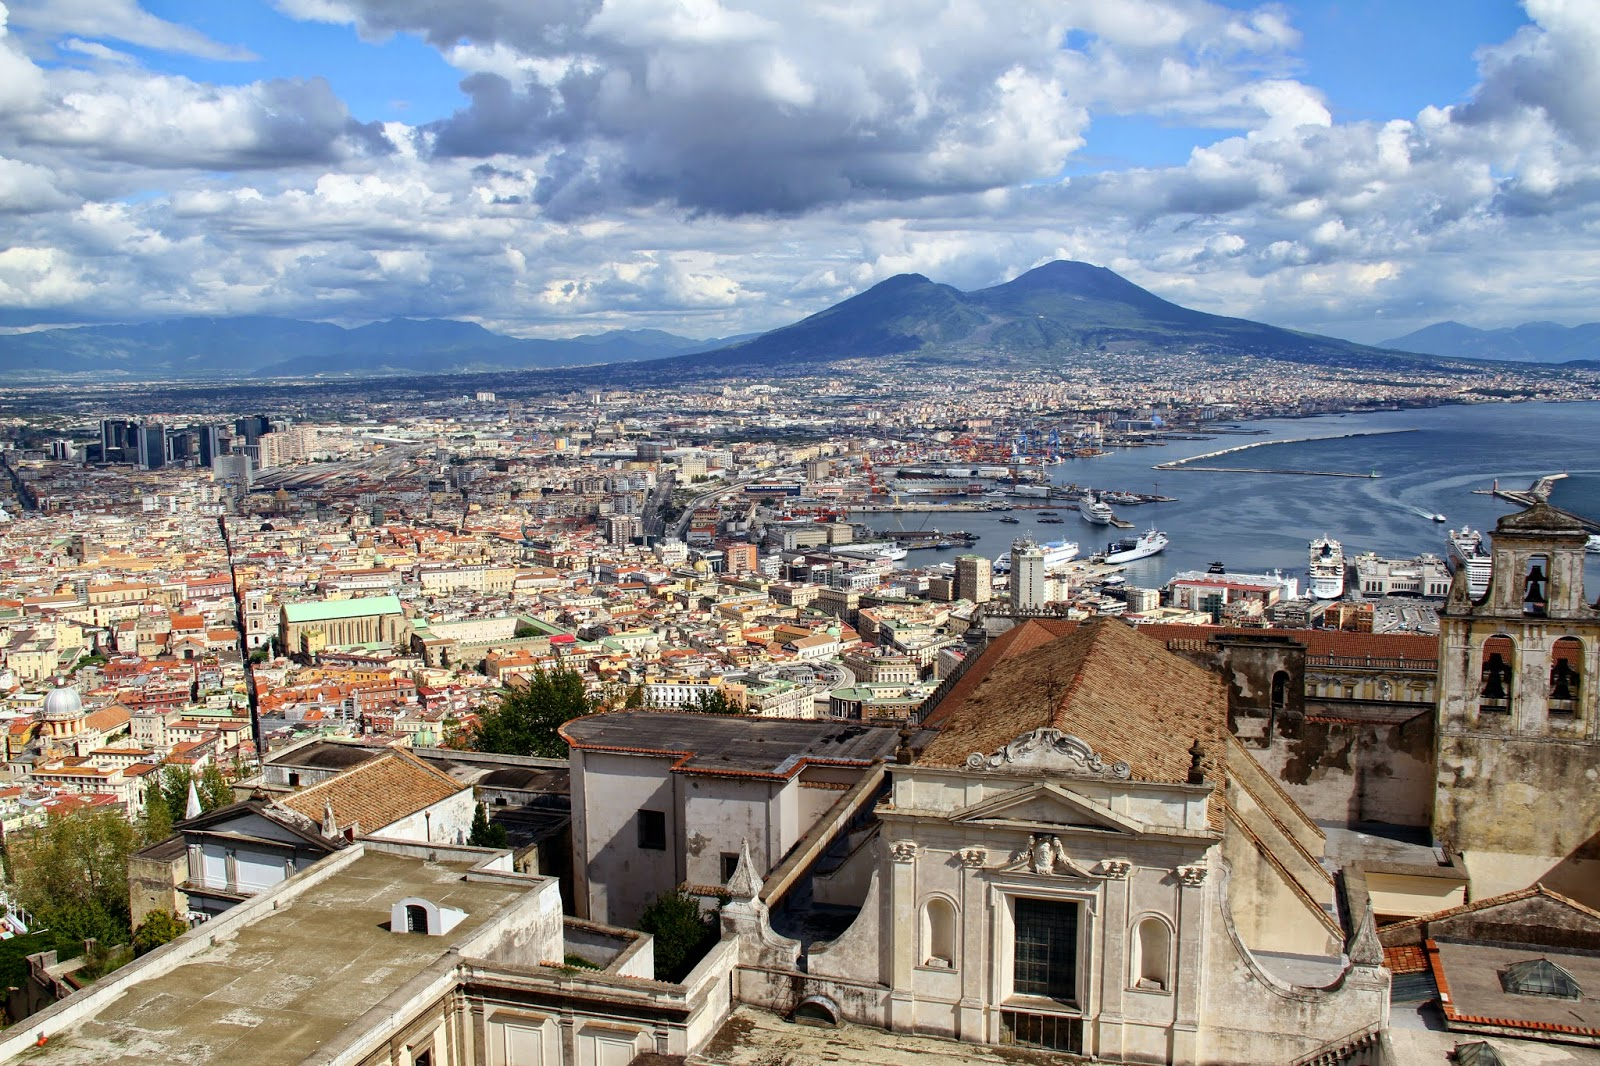 mt vesuvius, naples, italy, amalfi coastline